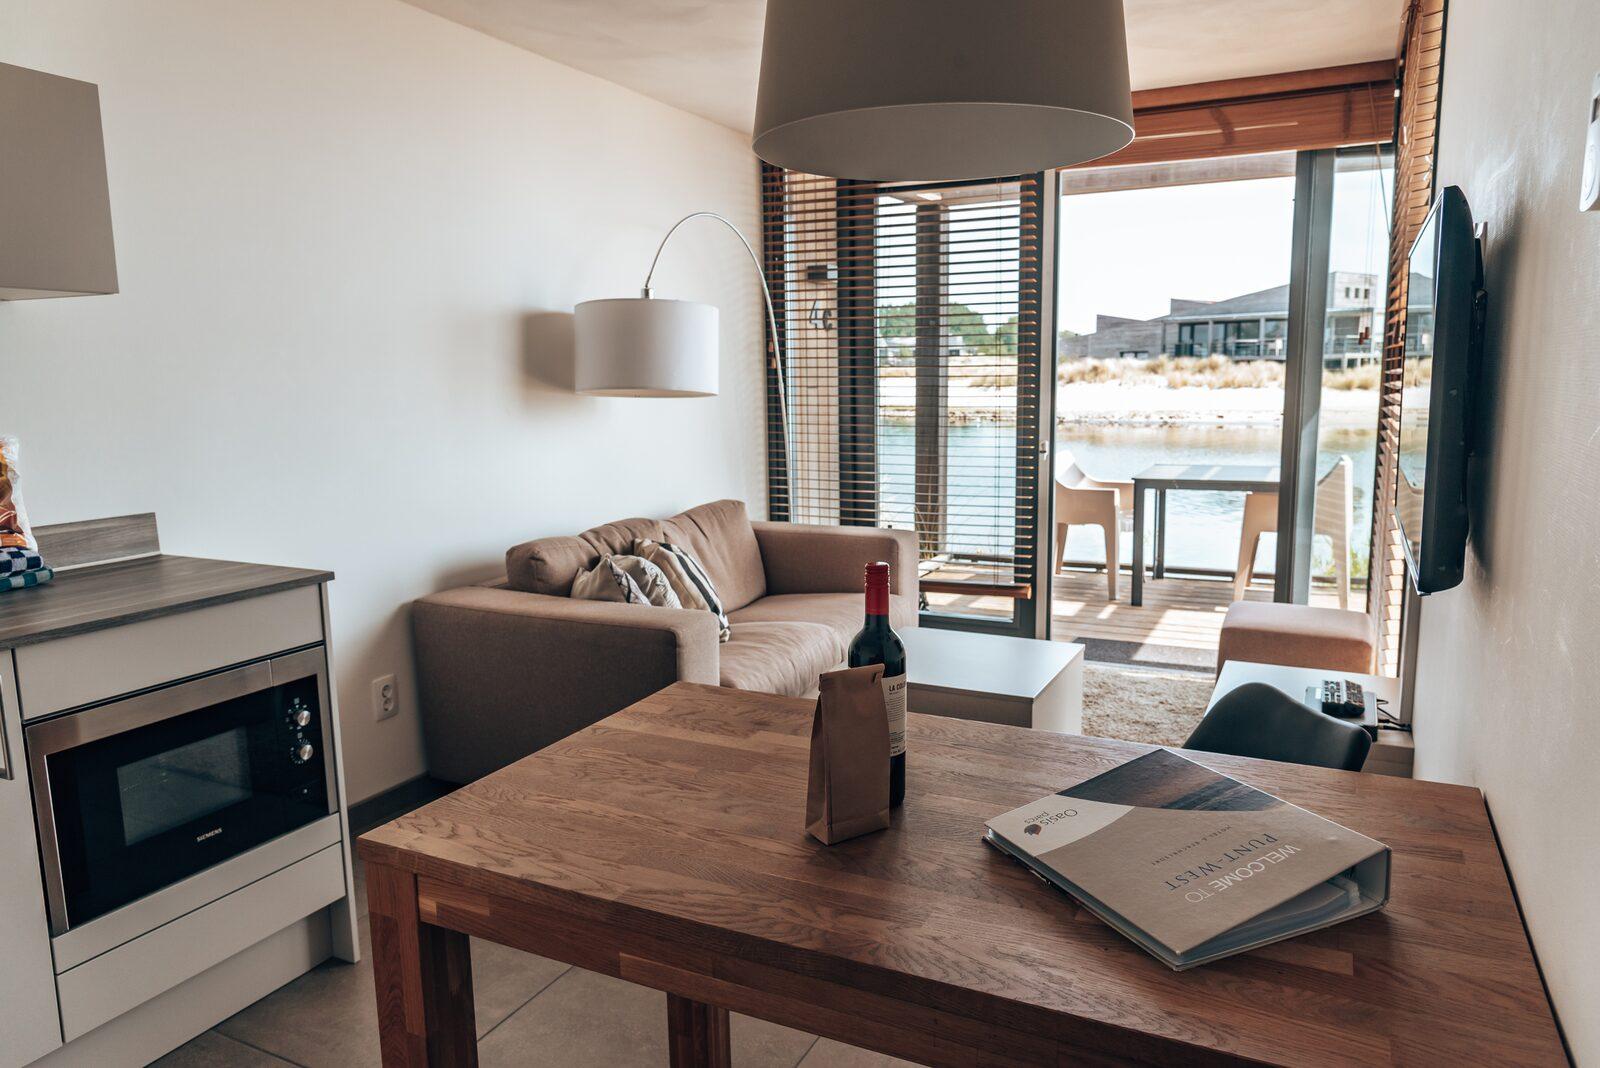 Hotelstudio Family | 4 Pers.